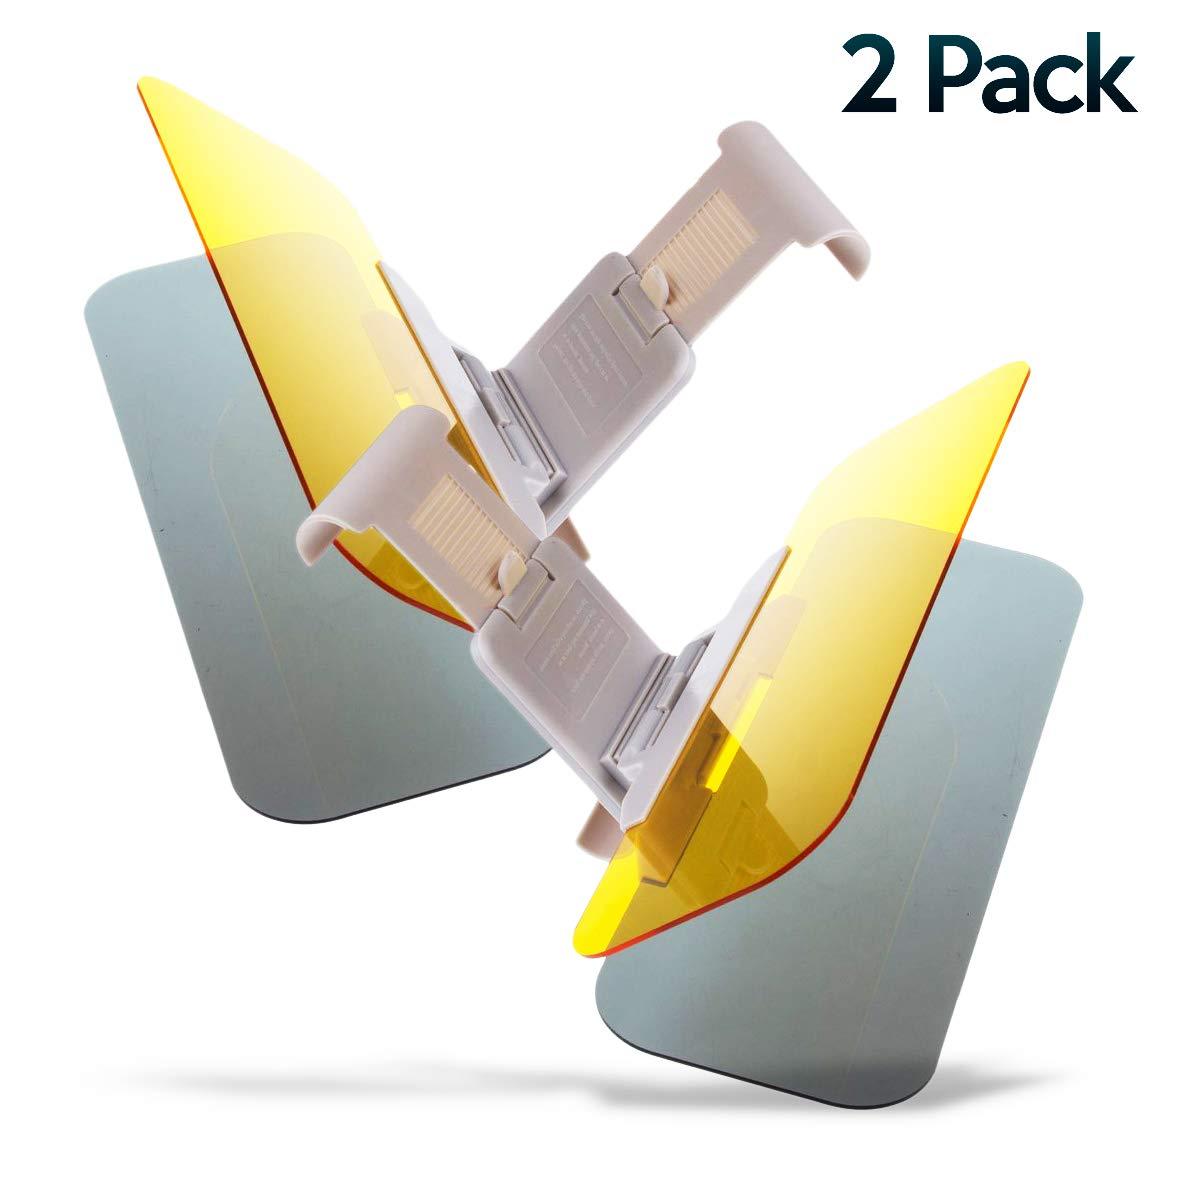 Car Windshield Tac Sun Visor Night Anti-Glare 2 Pack- Zone Tech Premium Quality Universal Sunshade and Night Vision Anti-Dazzle Windshield Driving Visor (2 Pack)